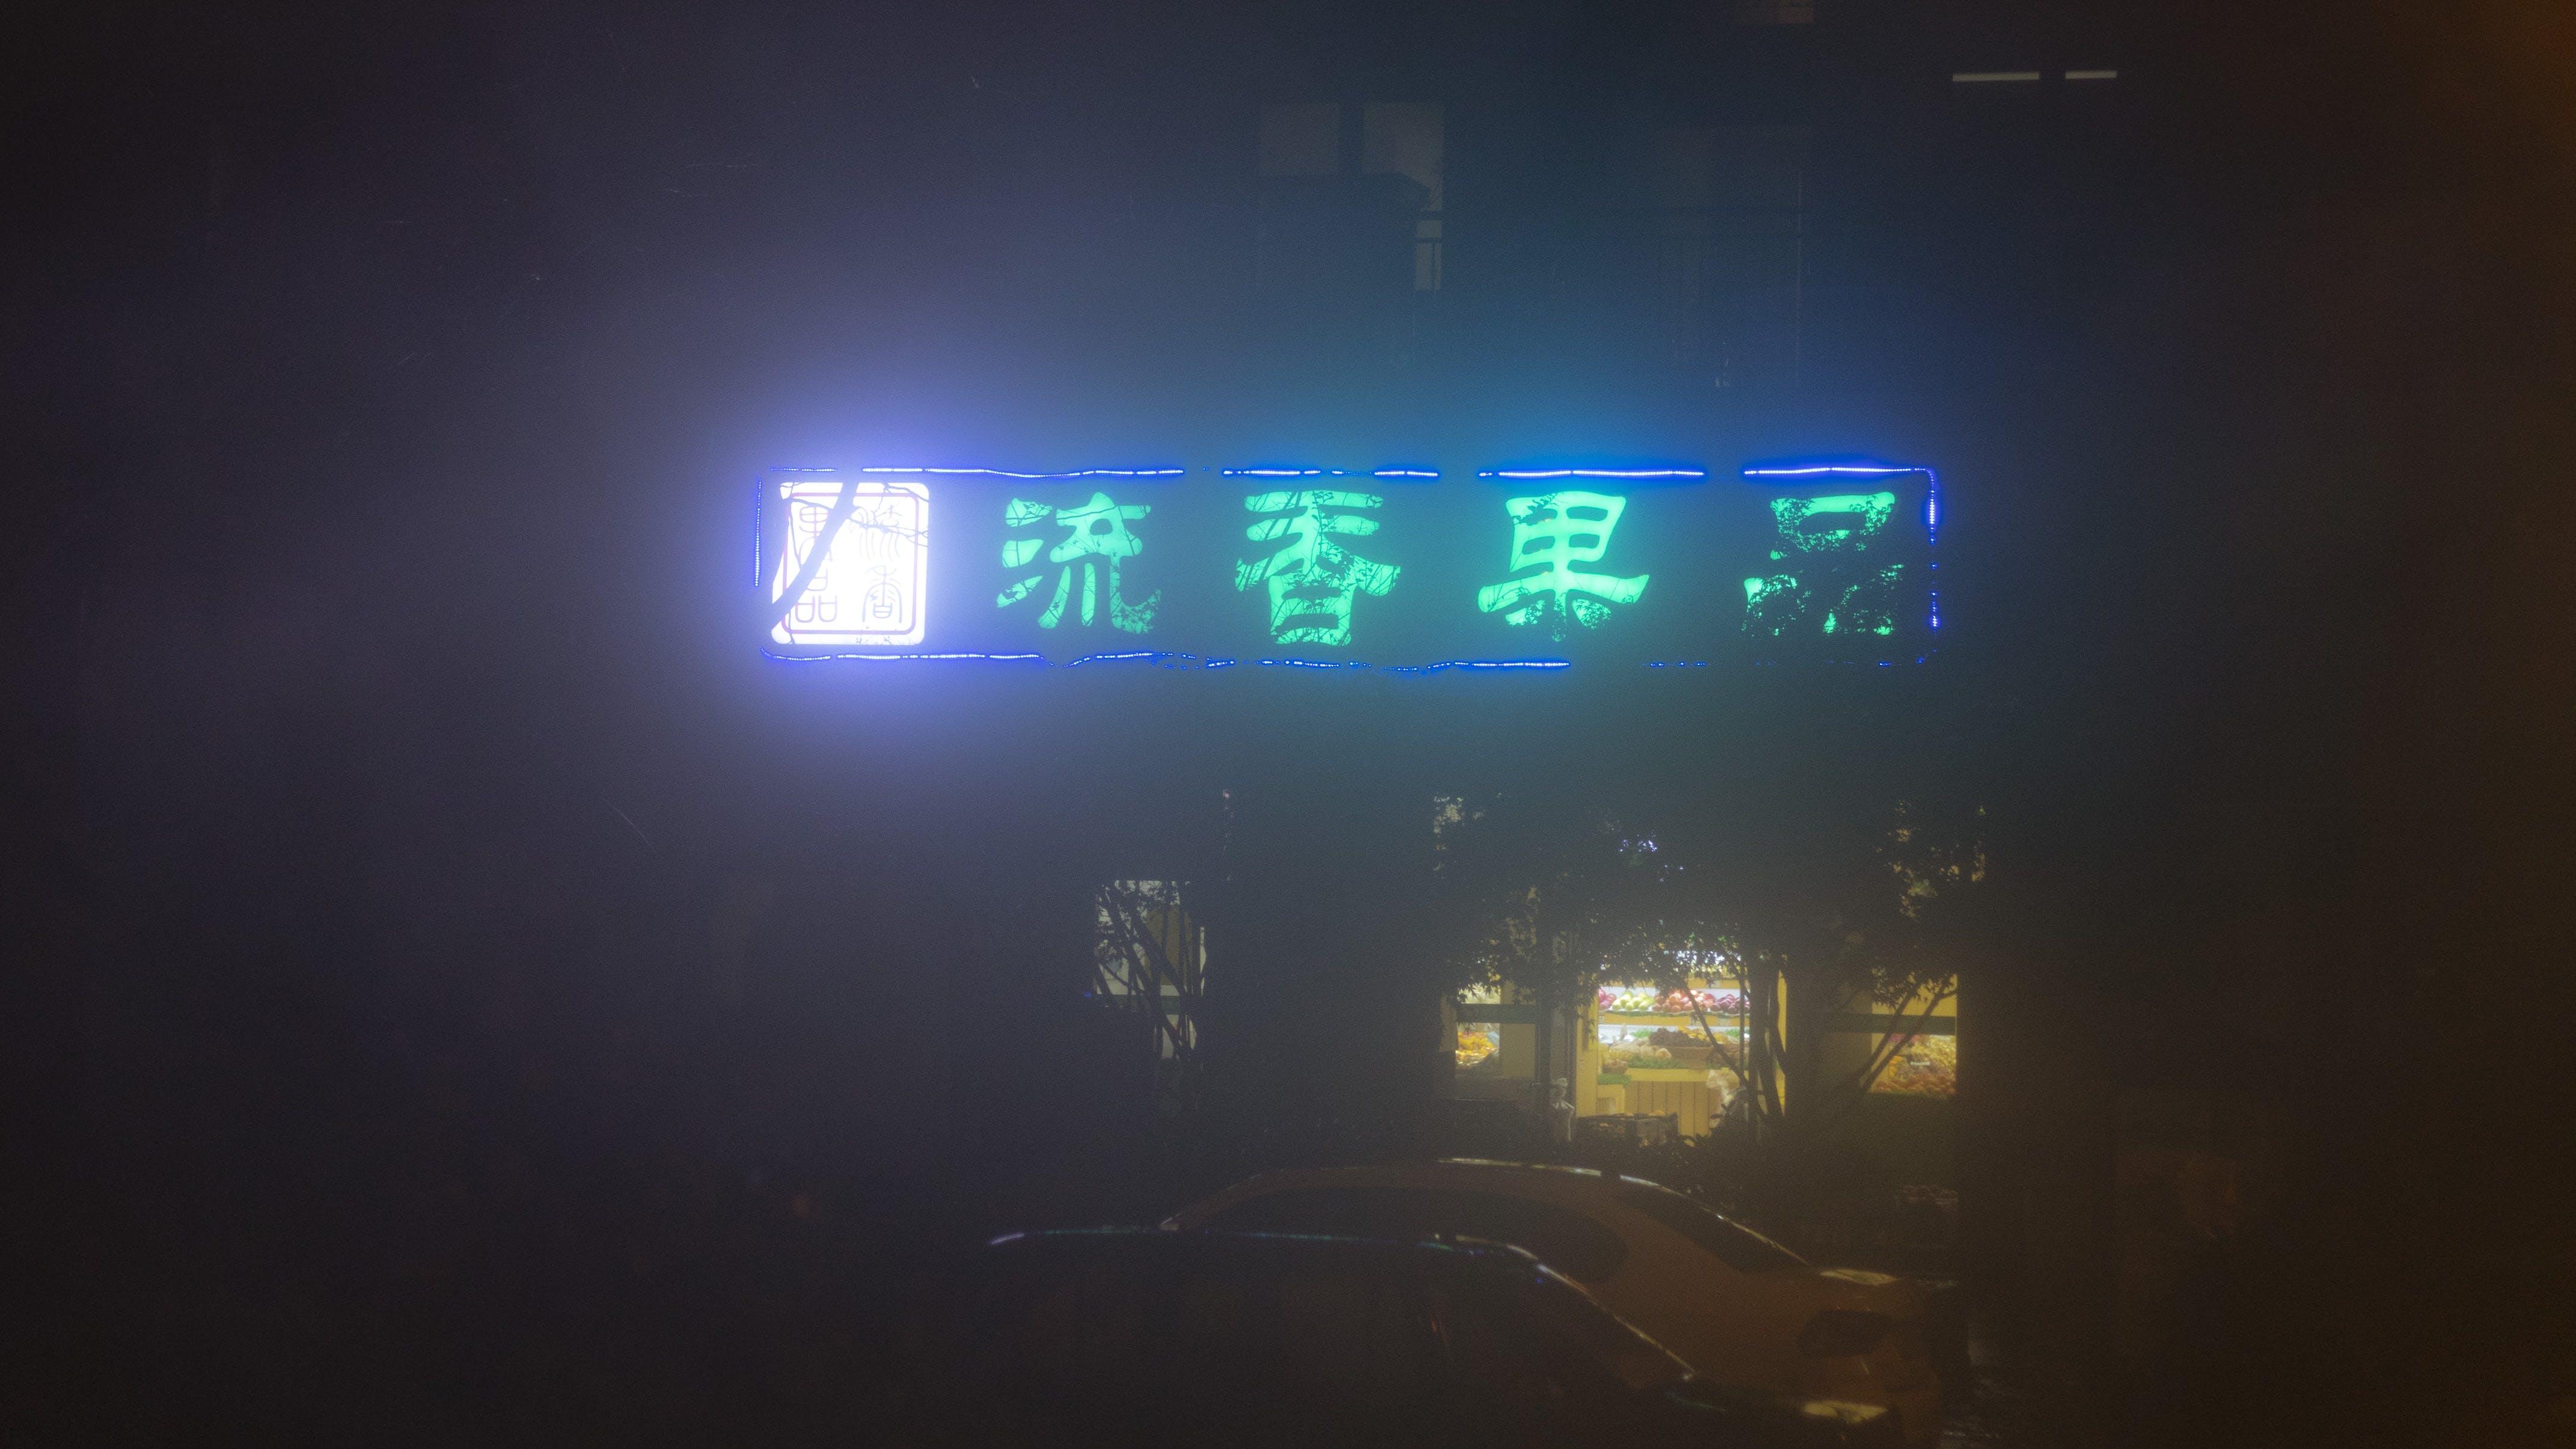 Free stock photo of neon light, 夜色, 霓虹灯